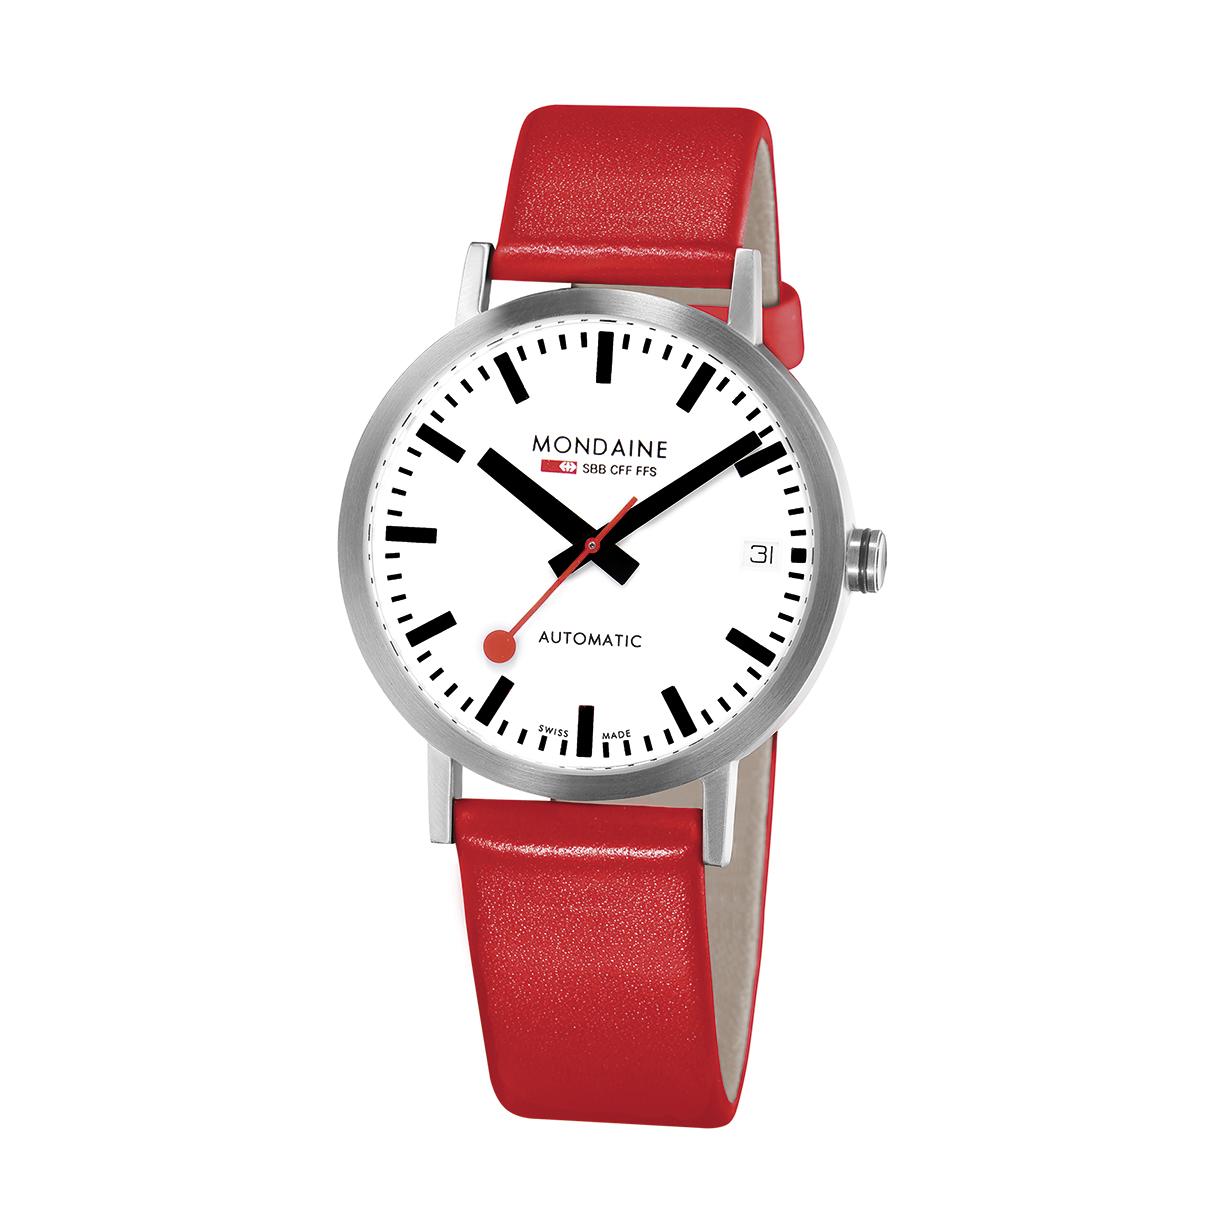 Mondaine classic automatic mondaine watches clocks - Mondaine travel clock ...